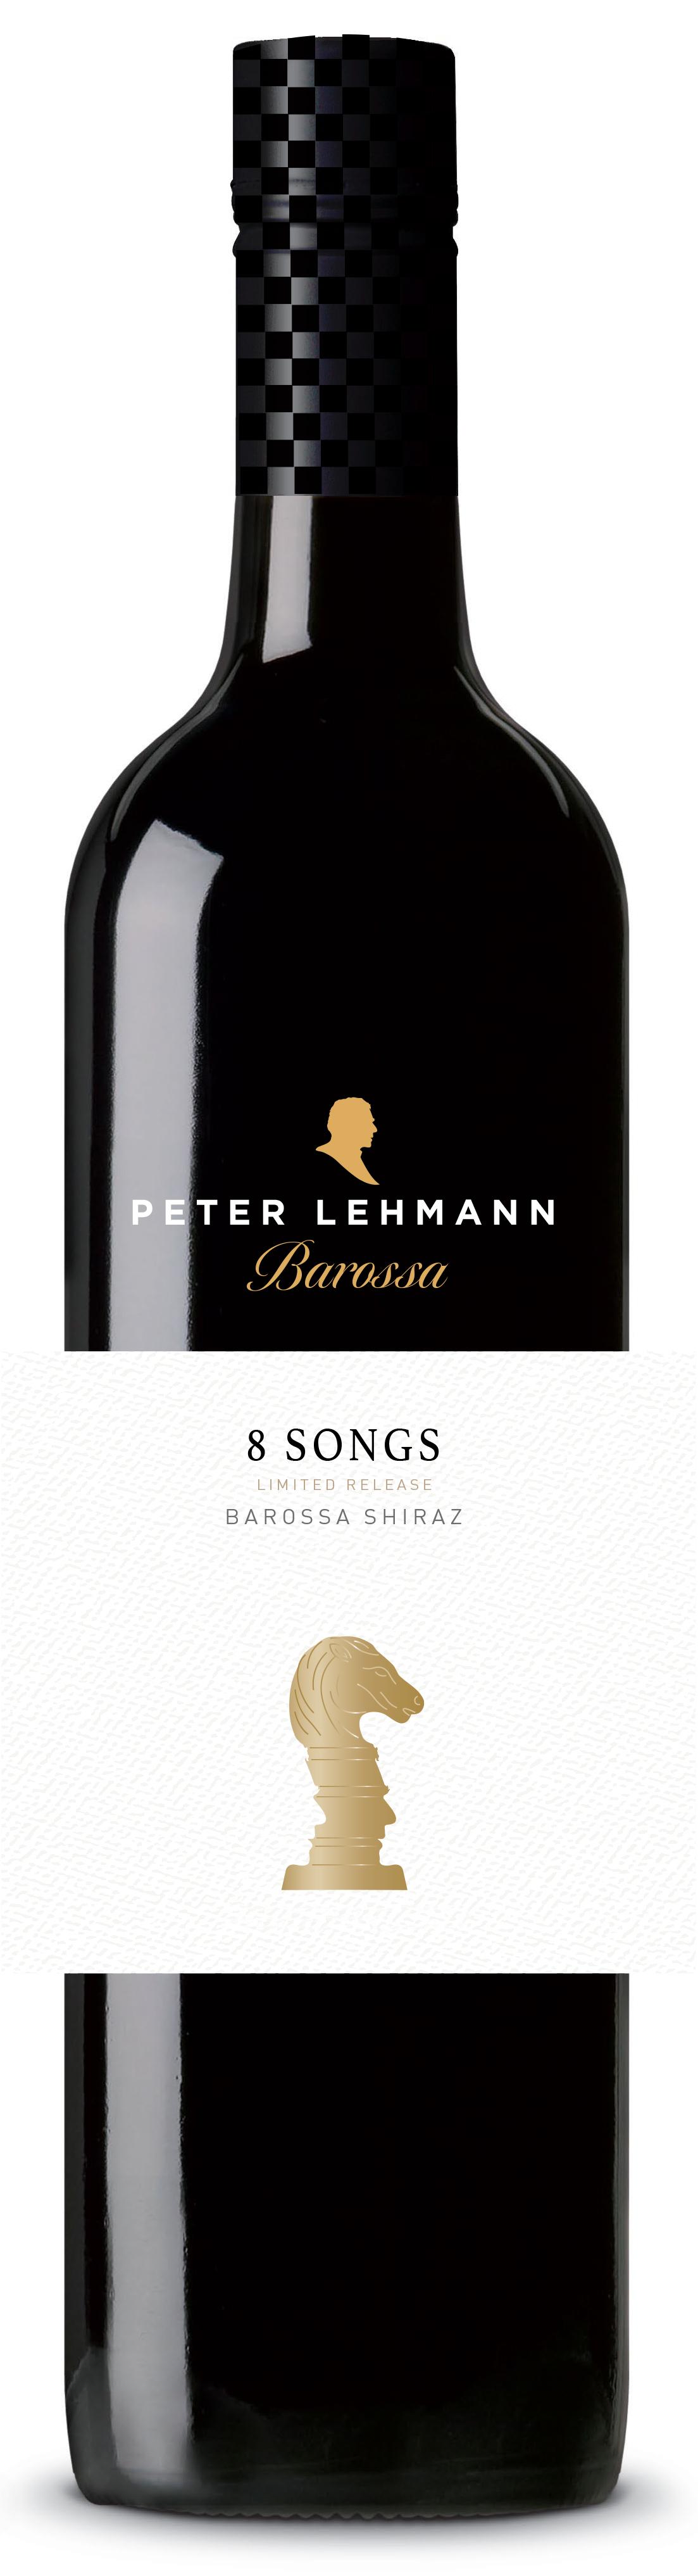 Peter Lehmann Masters, `8 Songs` Shiraz 2013